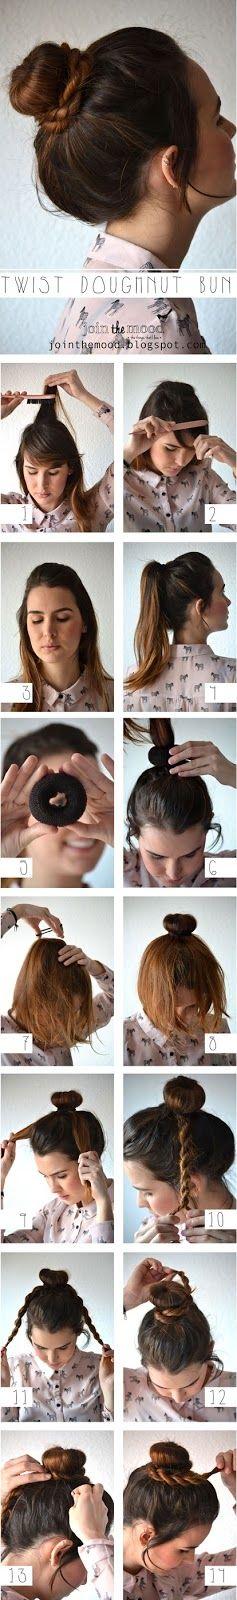 How To Make Twist Doughnut Bun For Your Hair |